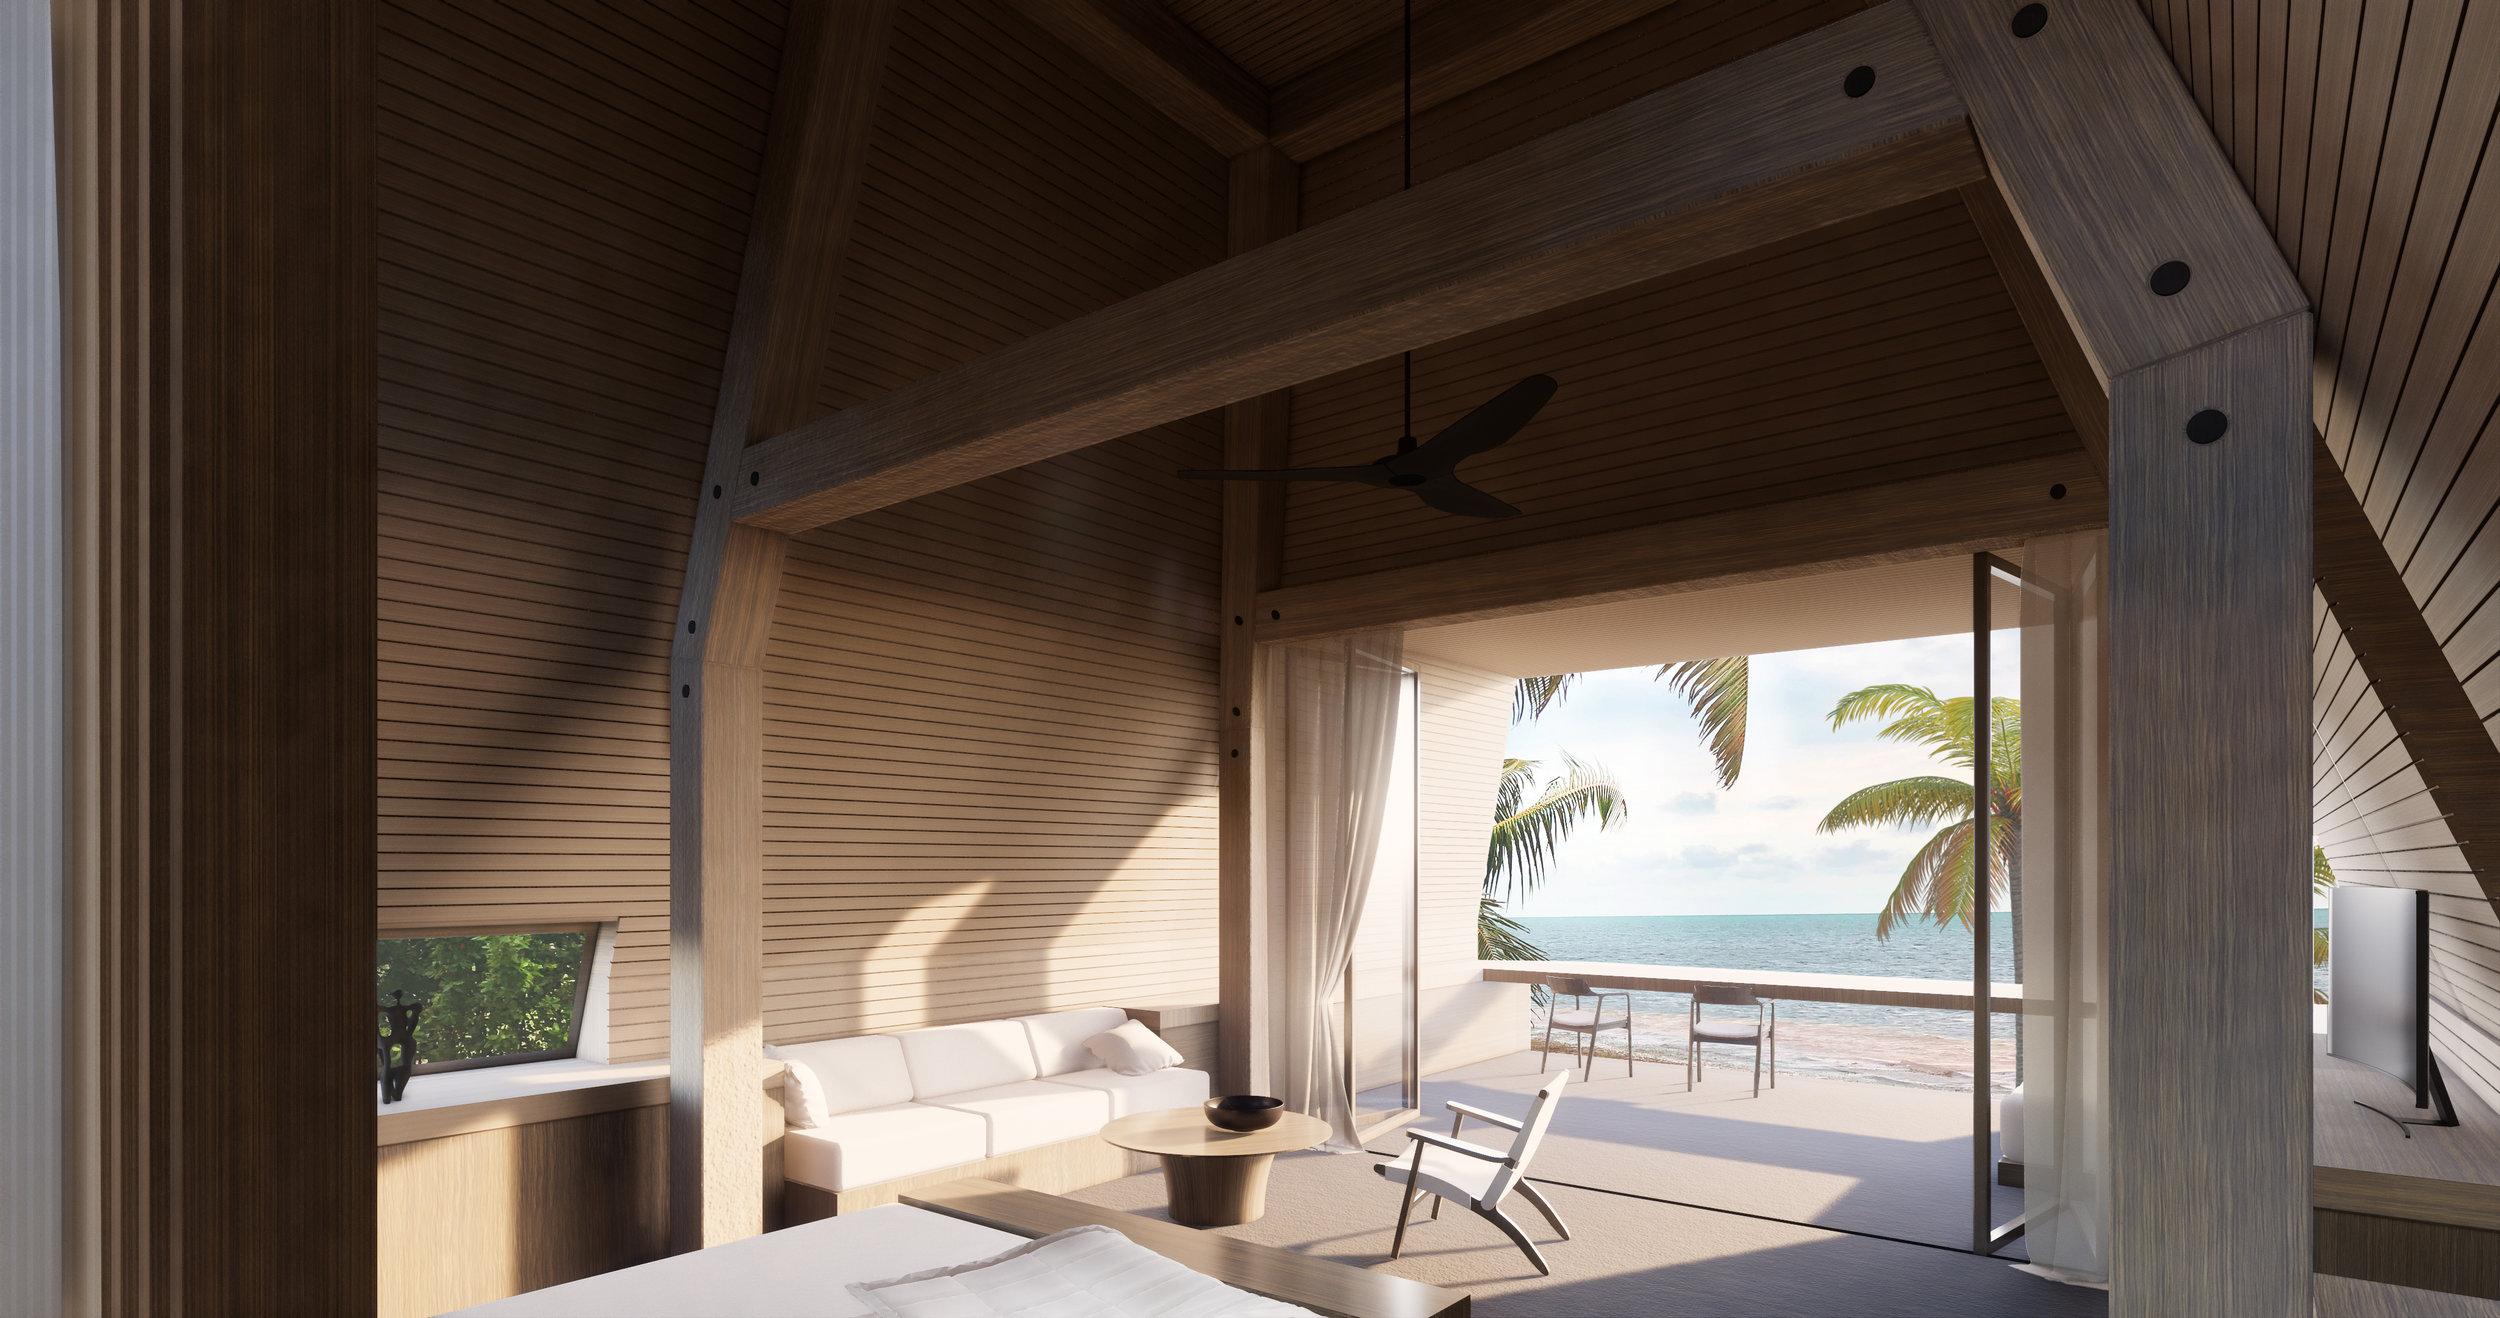 180806_SC_CC_Caribbean Hut Type_Concept Render.jpg